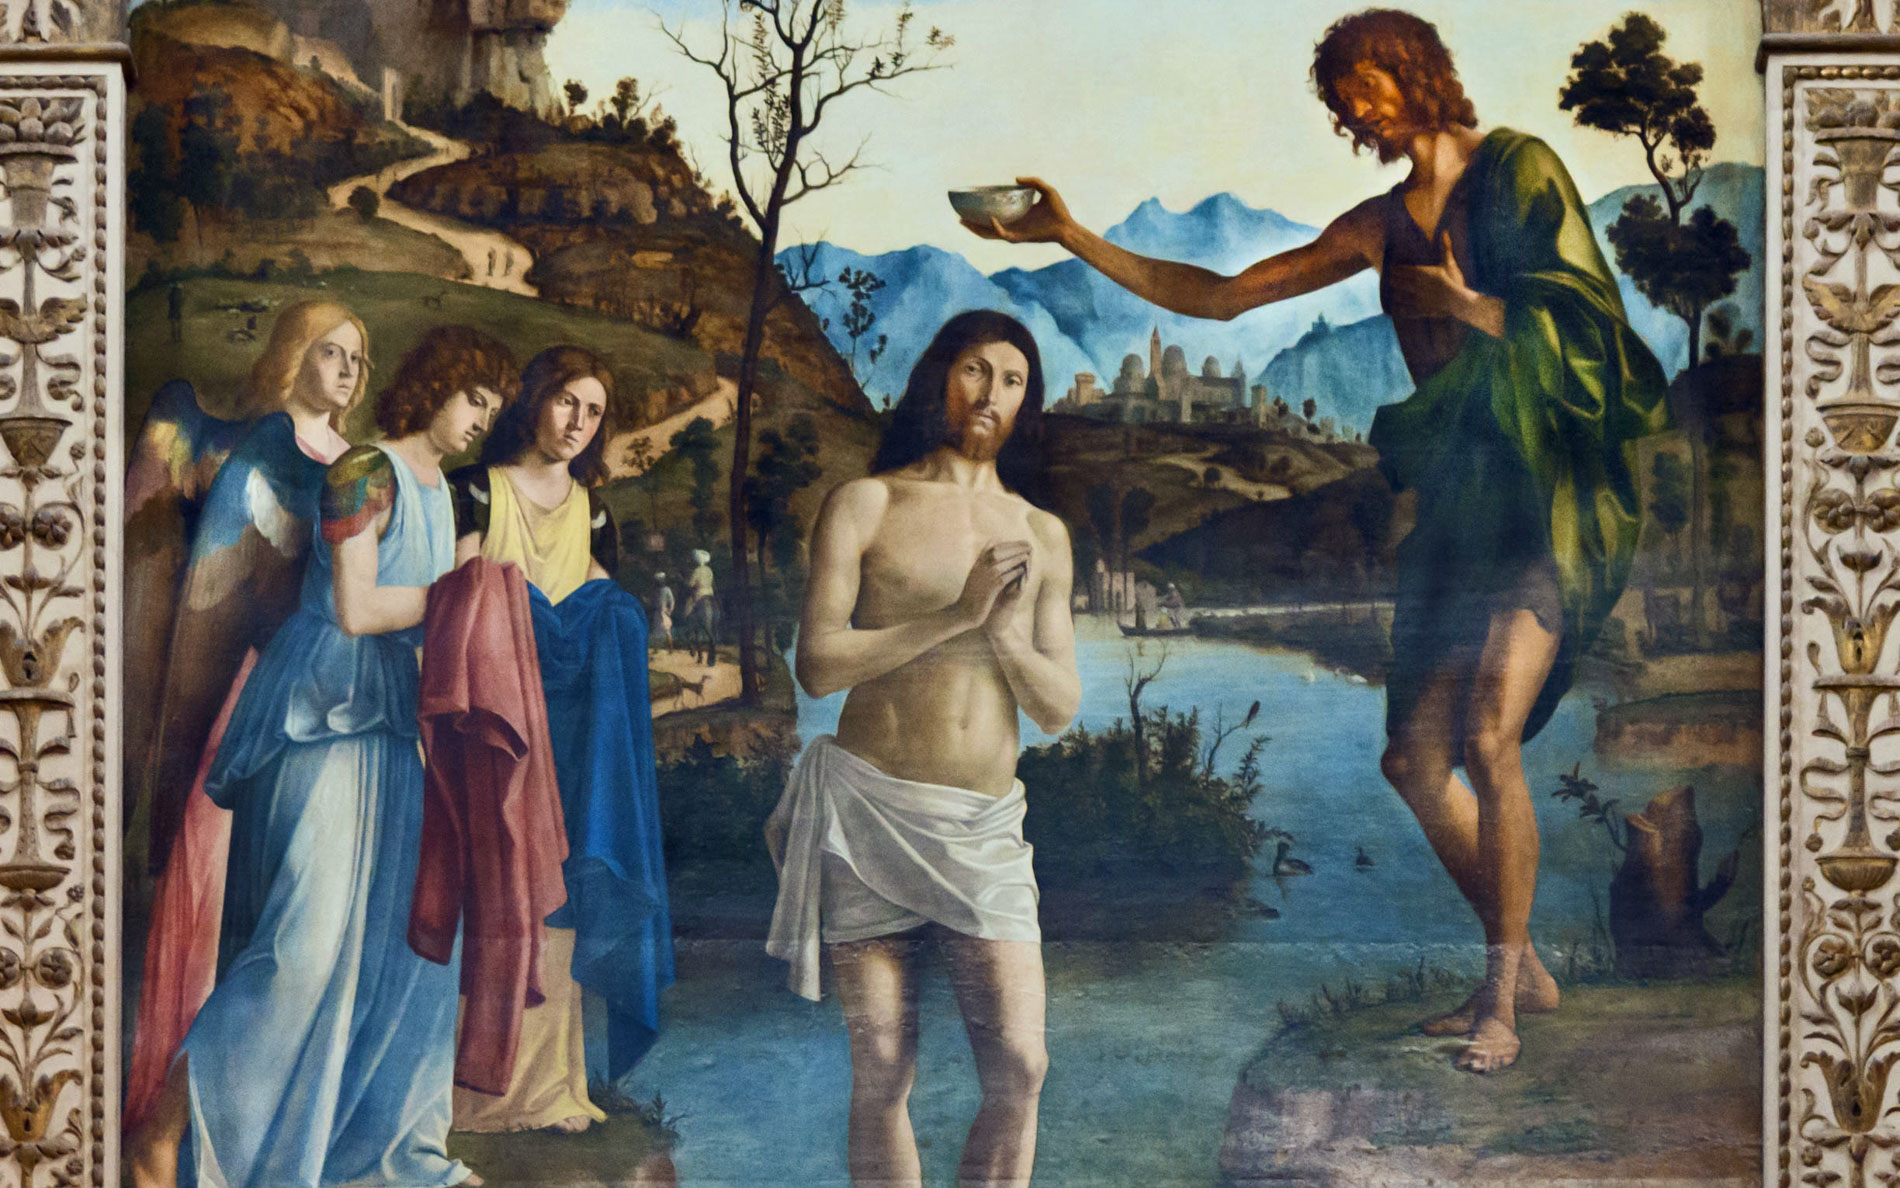 ambrose old testament prefigurations types baptism RCIA mystagogia